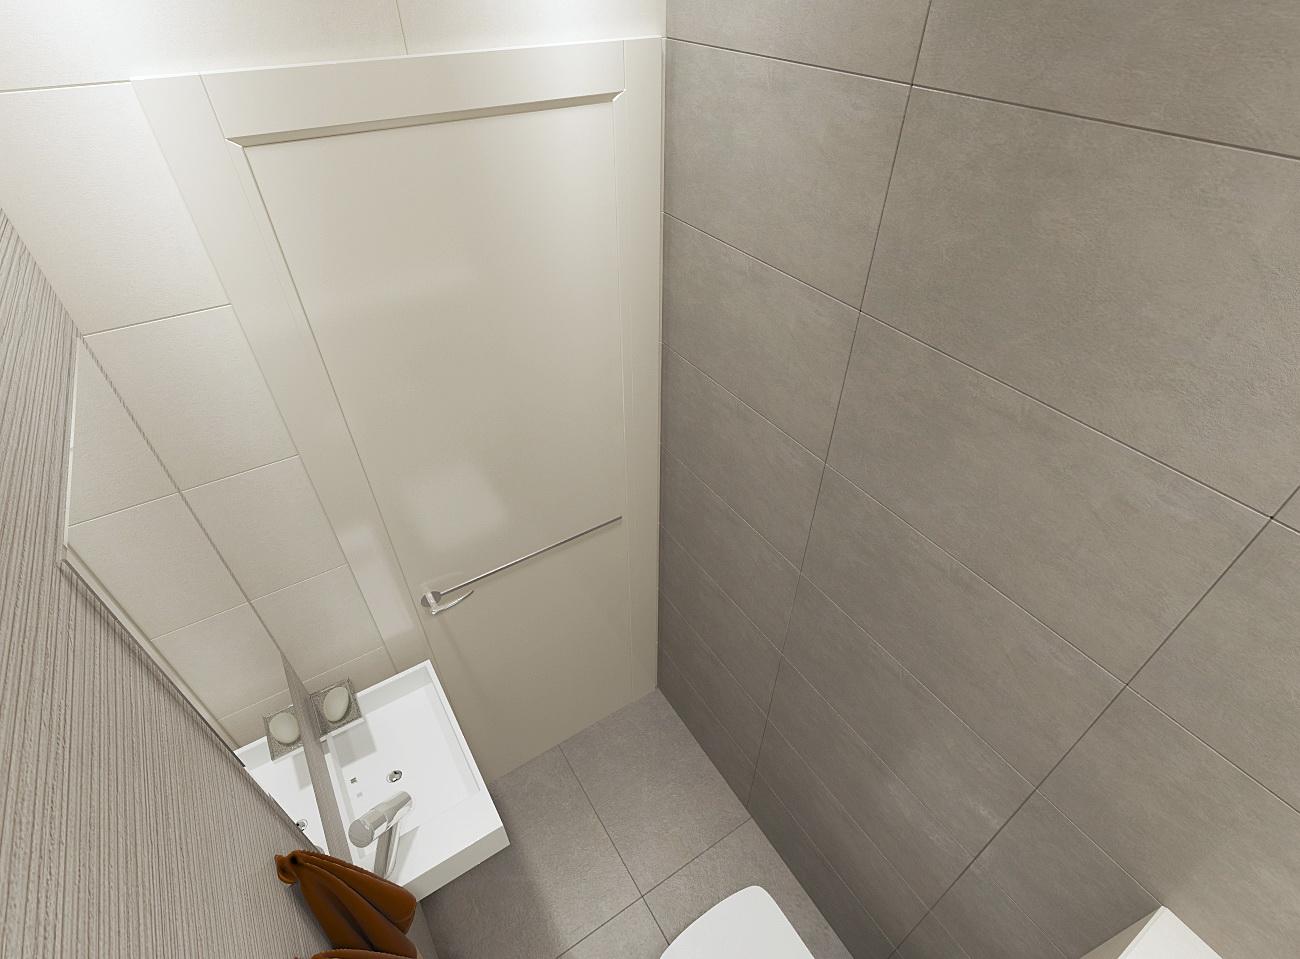 Dizajn-tualeta-1-5-kv-m-v-sovremennom-stile-6